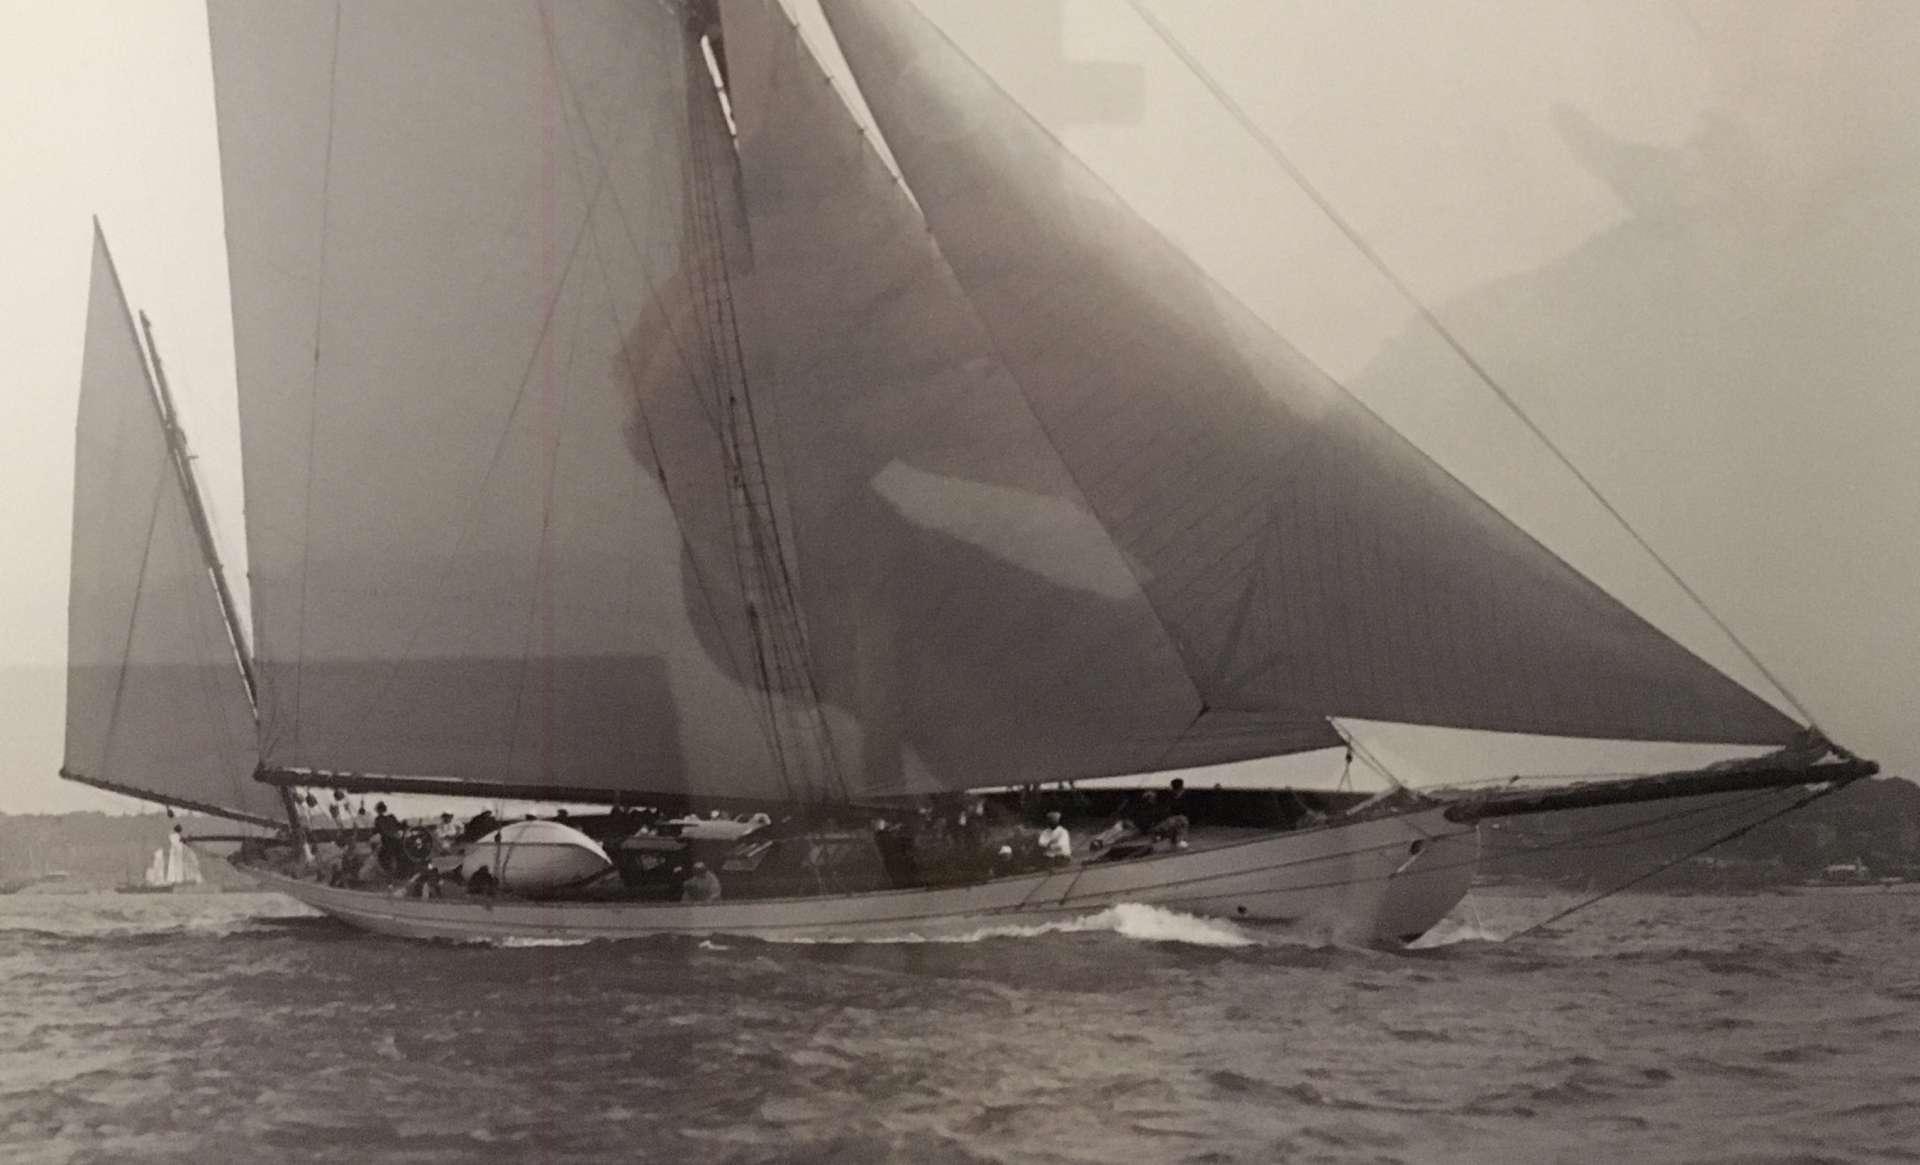 Bekens photo - original rig 1899